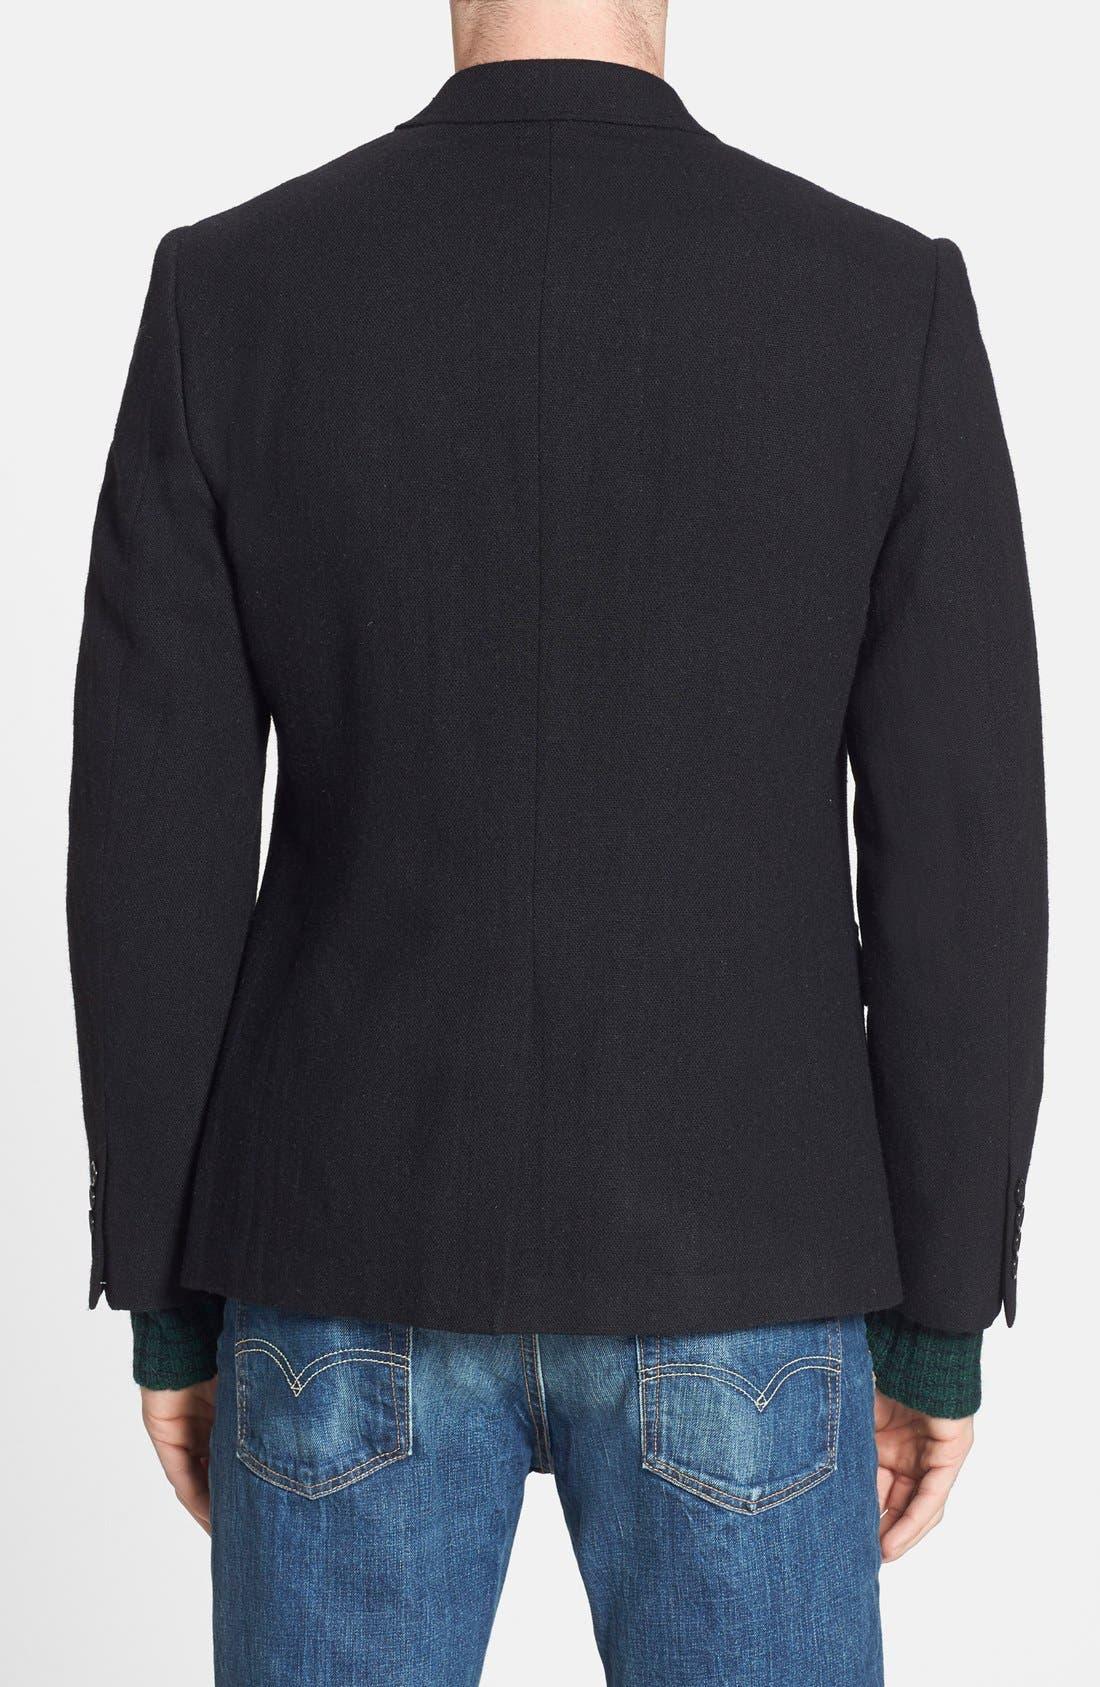 DOCKERS<SUP>®</SUP>, Dockers Trim Fit Wool Blend Blazer, Alternate thumbnail 5, color, 001